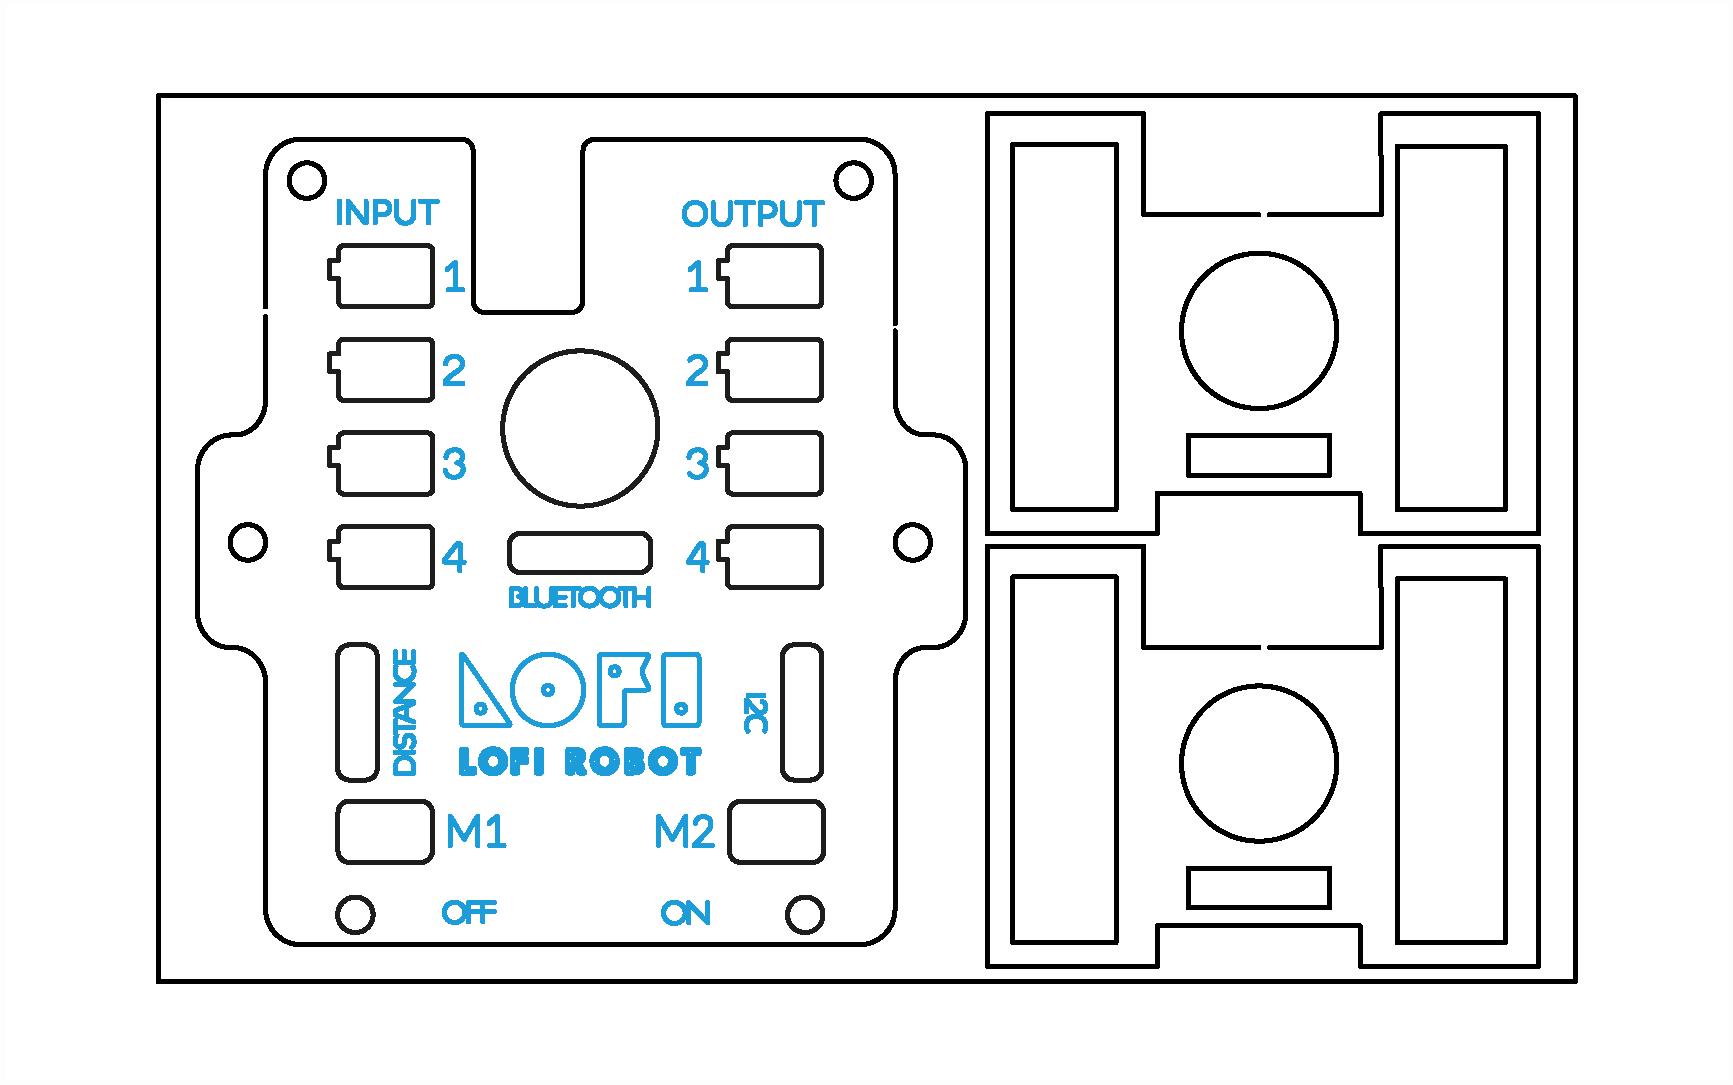 LOFI_Robot_Rover_assembly